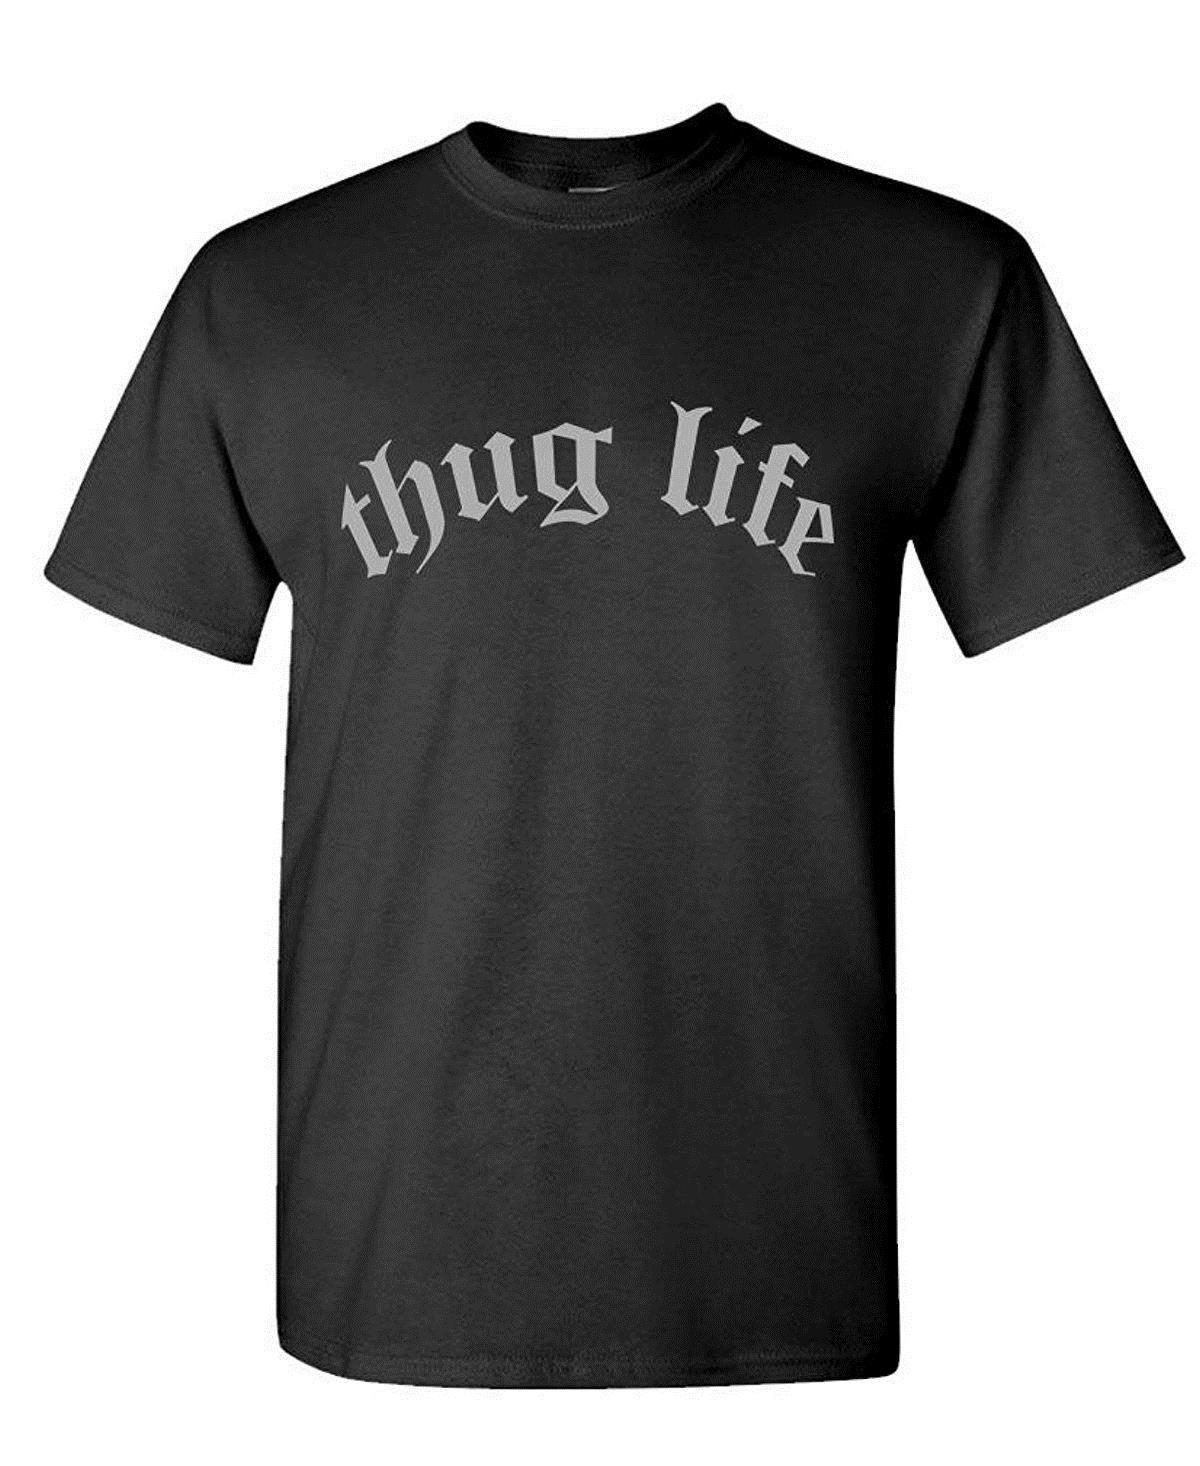 f643cb6e347 T Http   Post.AlShirt Company Crew Neck Short Sleeve Compression Design  Printer Short Thug Life Printing O Neck T Shirts For Men Pt Shirts Tourist  Shirt ...